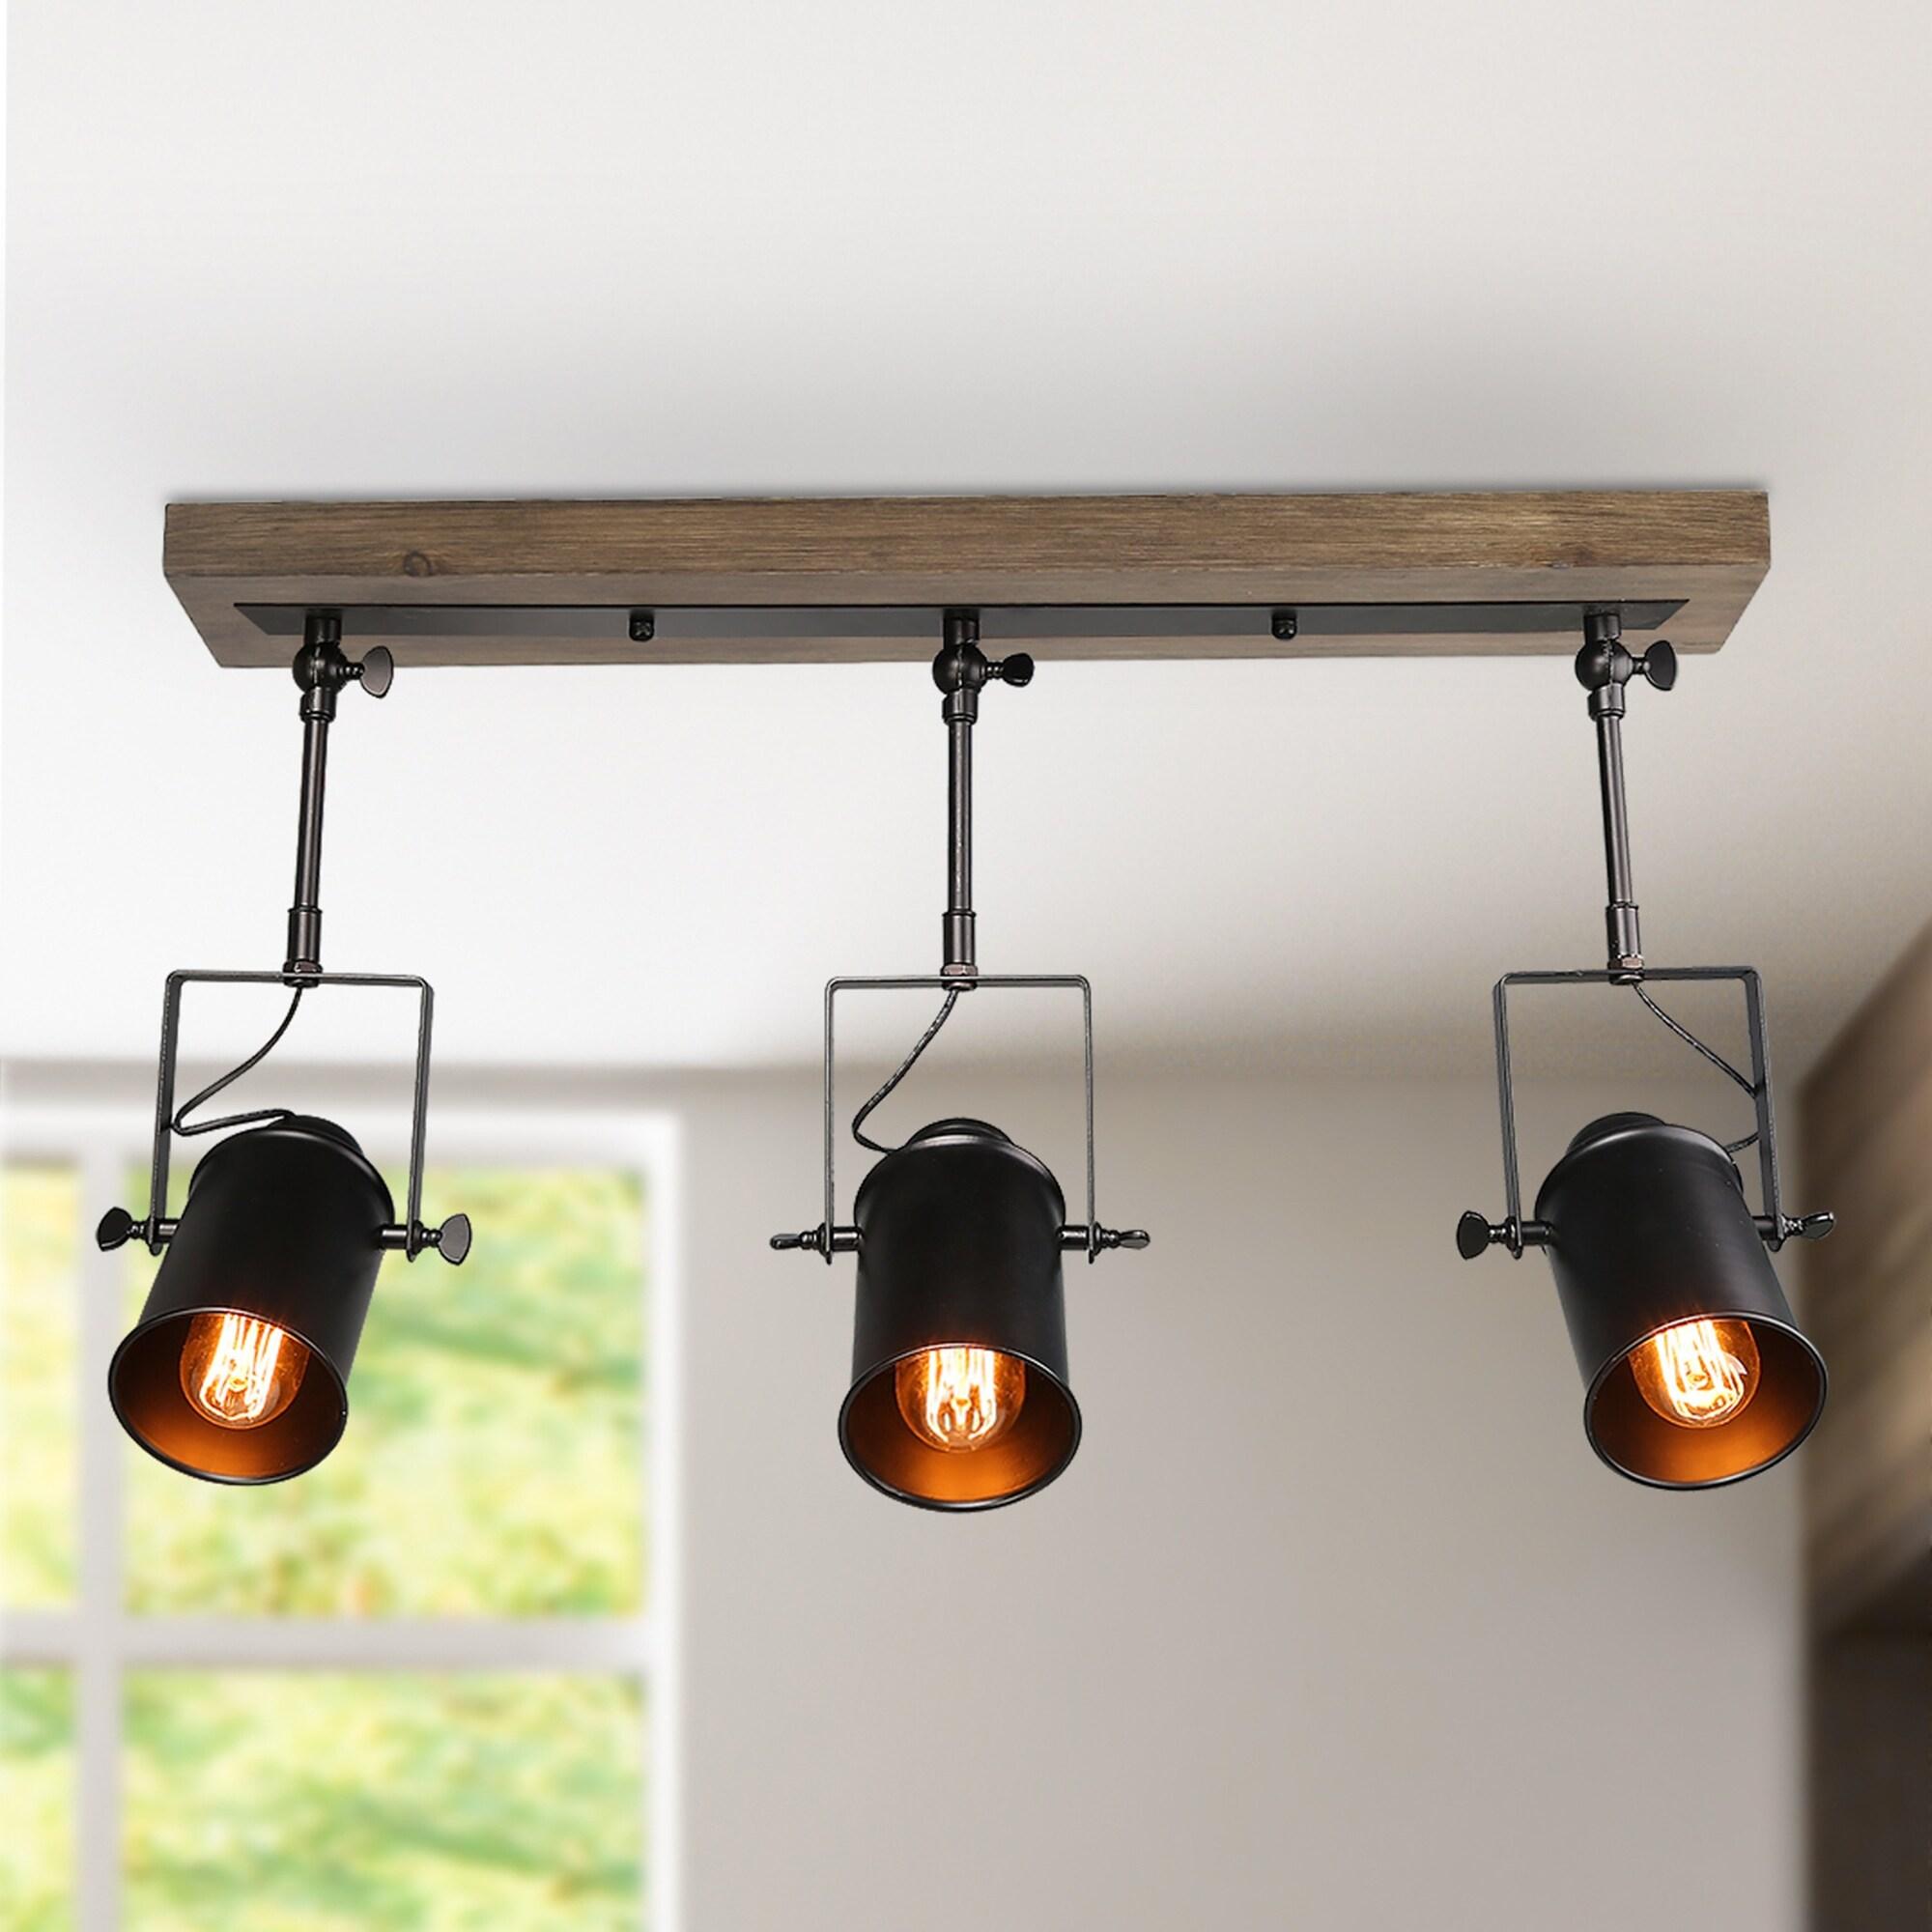 lnc modern farmhouse 3 light wood ceiling track lighting spotlights 24 8 x 4 7 x 15 3